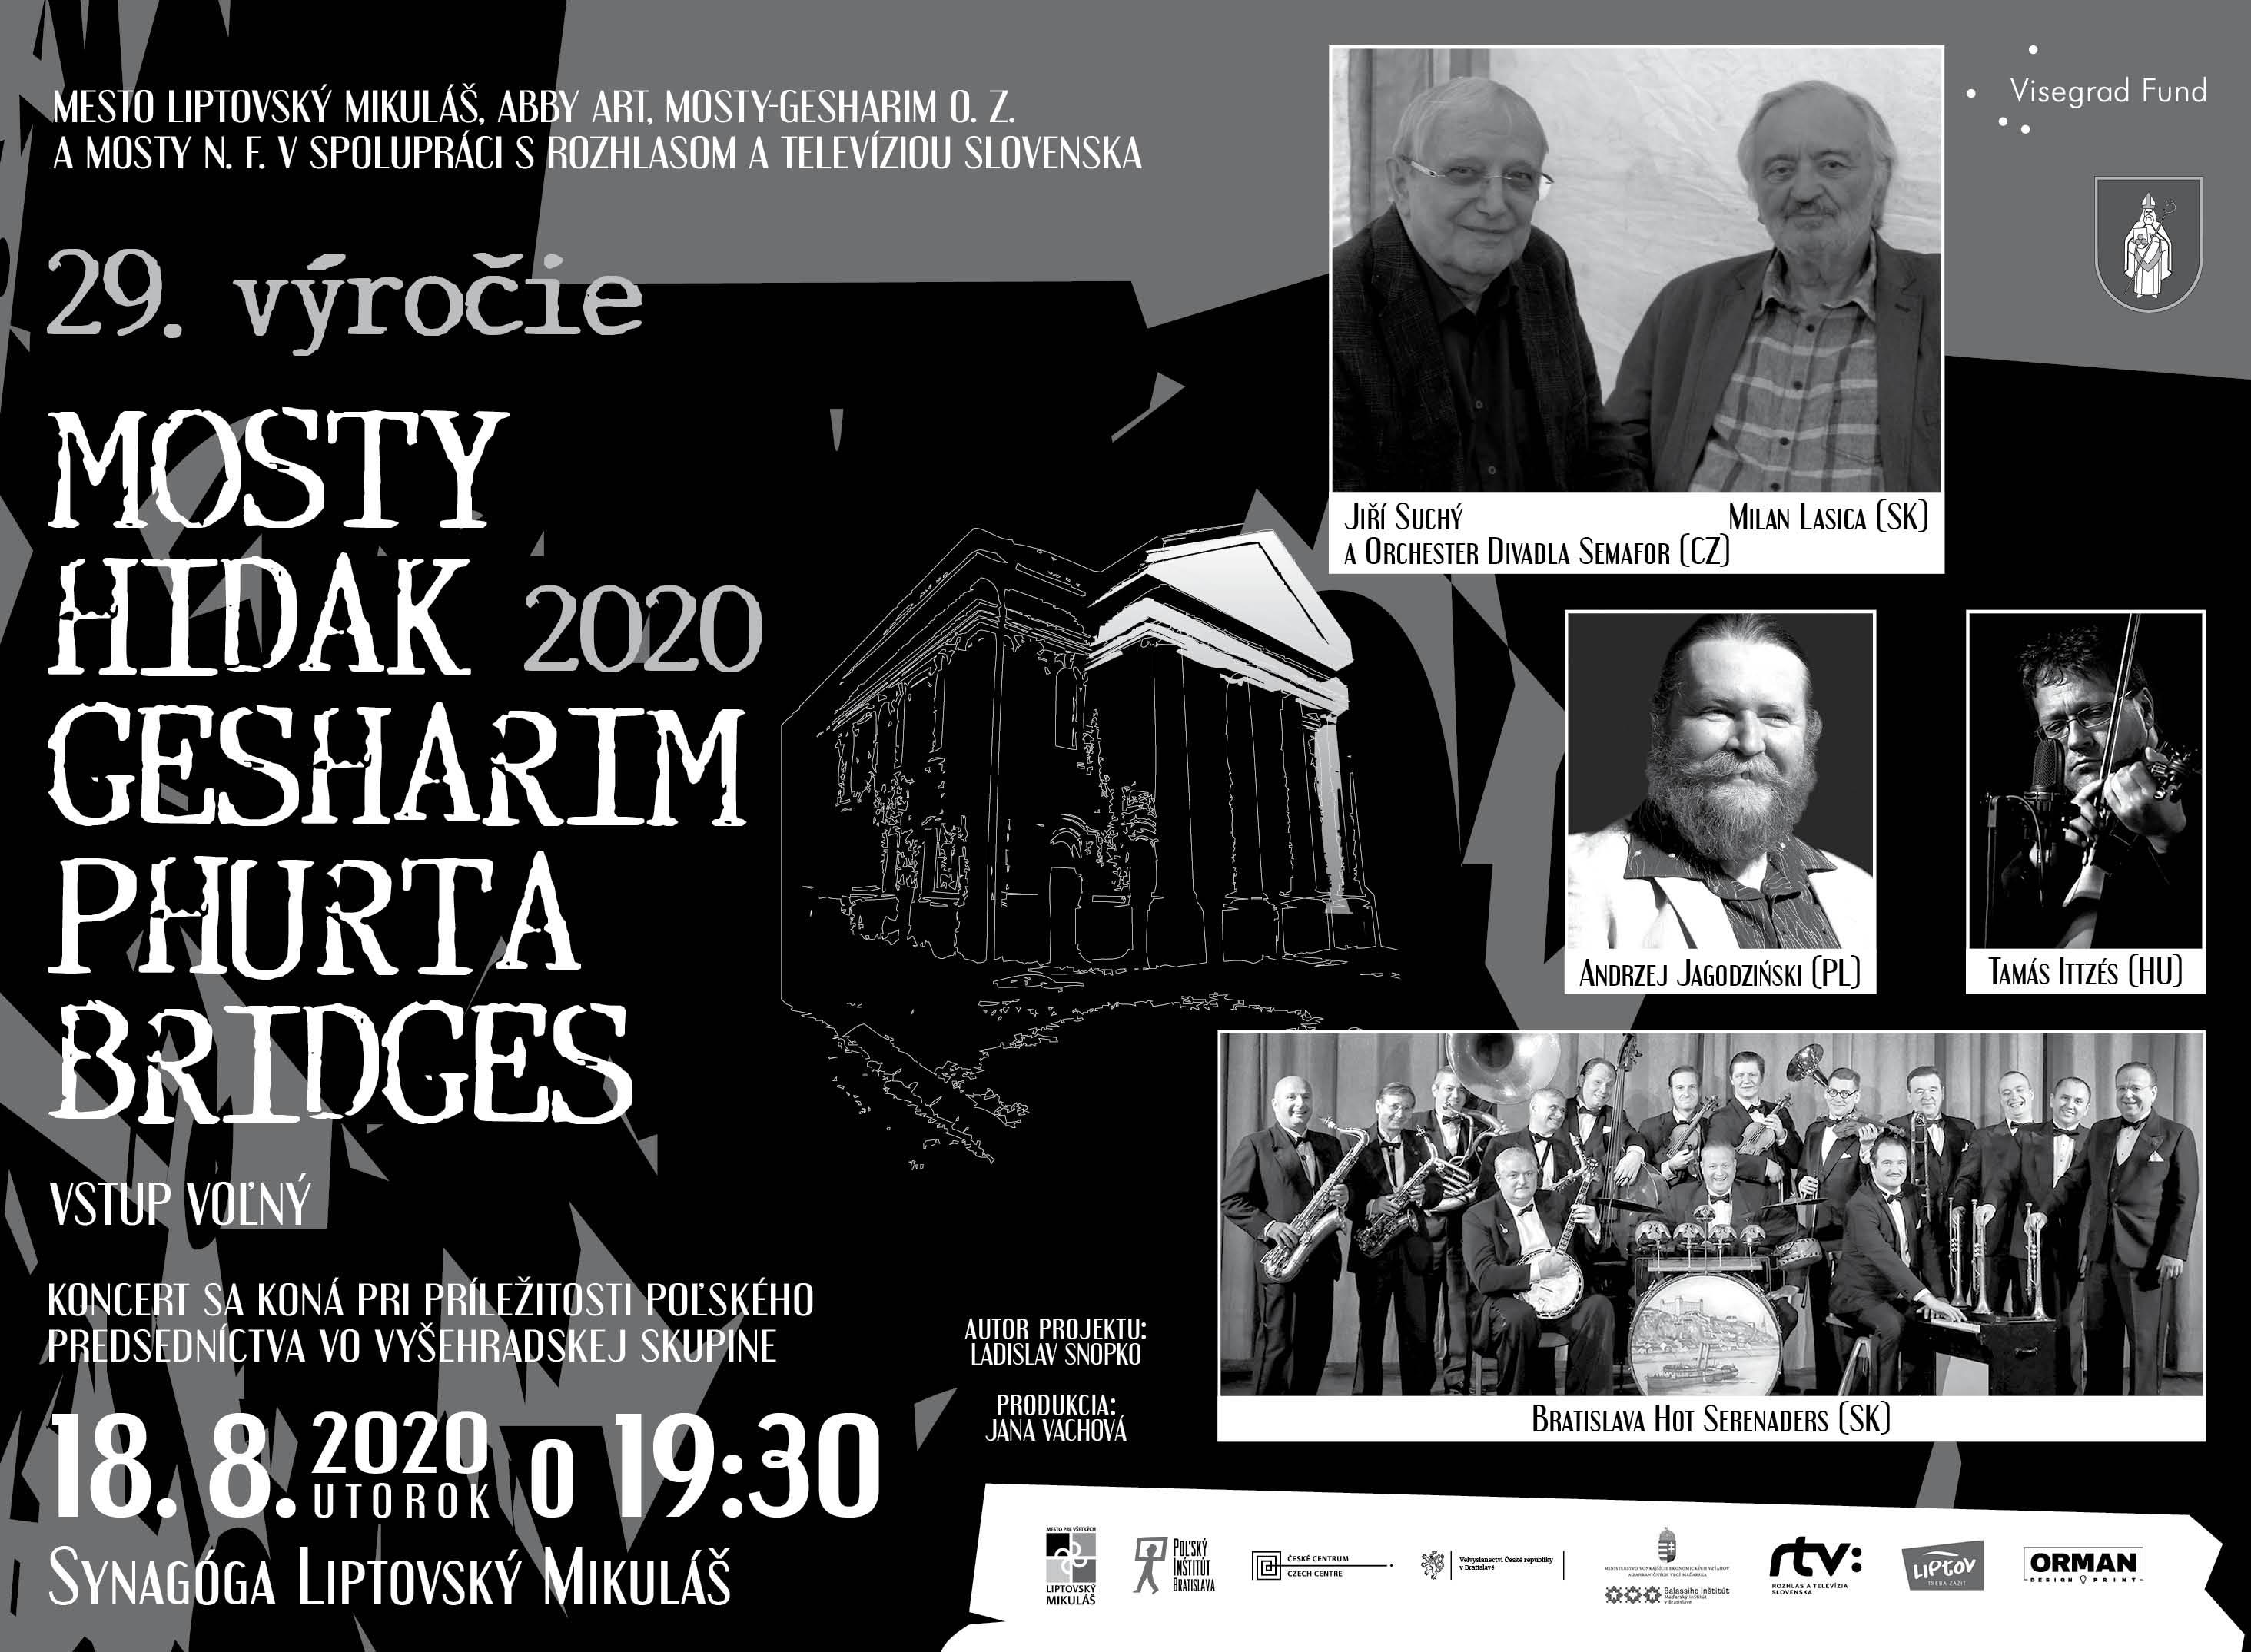 Mosty Gesharim 2020 pod taktovkou Lasicu a Suchého